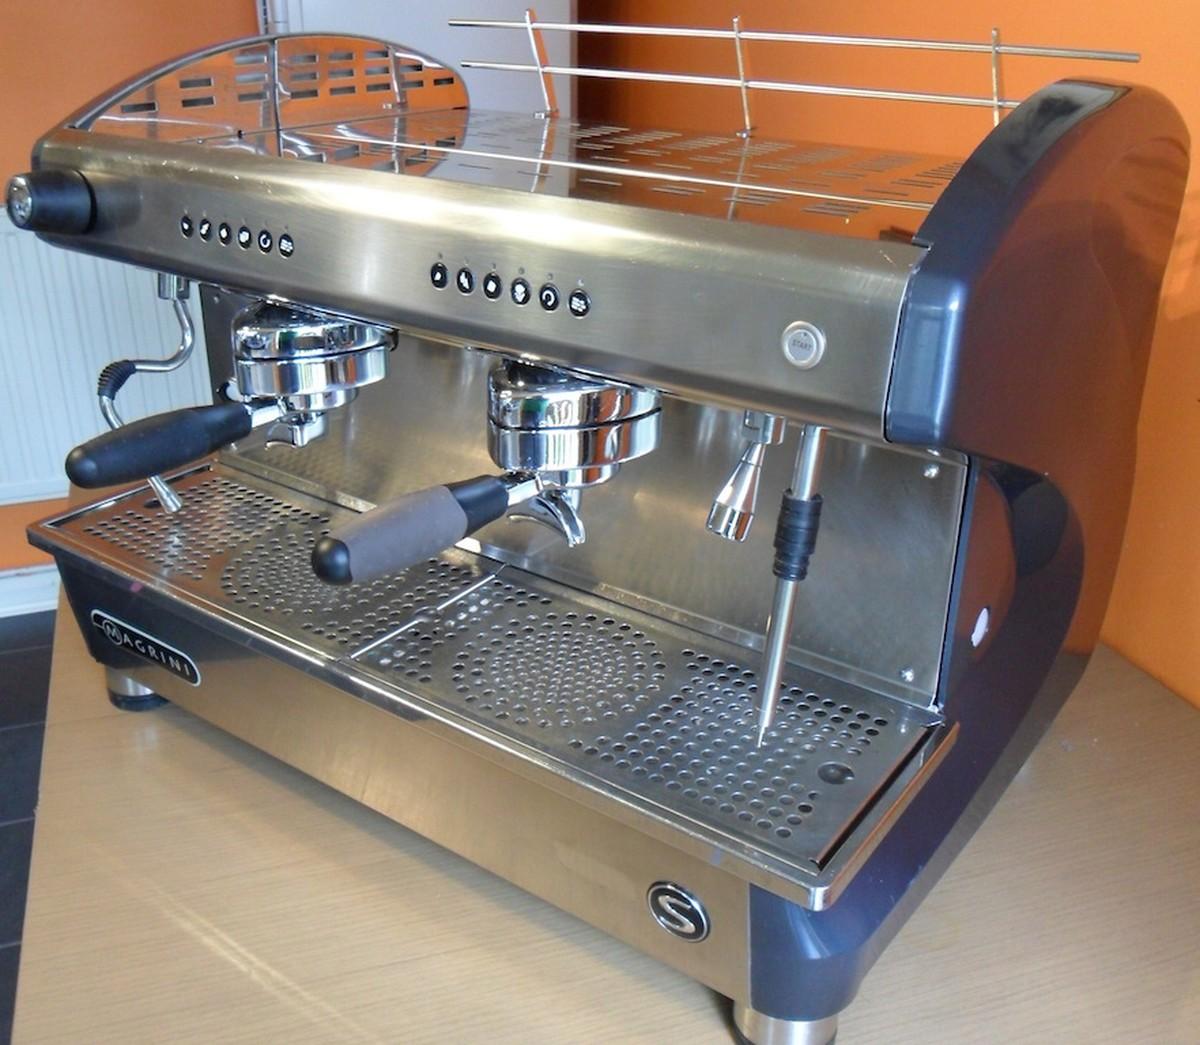 secondhand catering equipment 2 group espresso machines reneka rh secondhand catering equipment co uk Reneka Single Service Manual Reneka Basic Manual